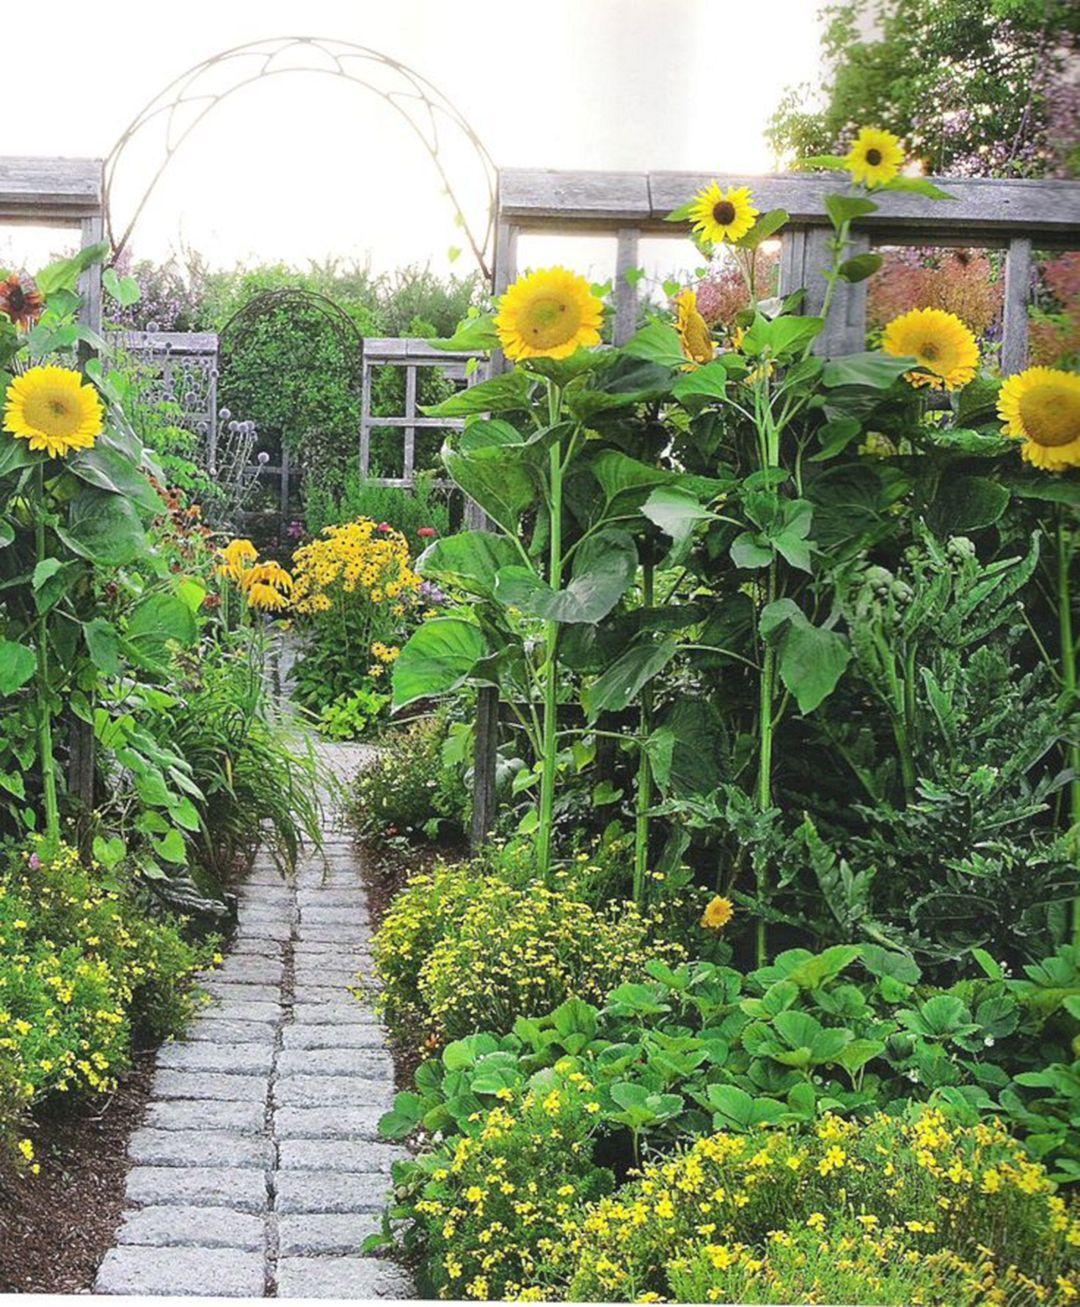 Impressive 25 Beautiful Sunflower Backyard Design For Your Garden Ideas Https Decorathing Com Sunflower Garden Flower Garden Design Beautiful Flowers Garden